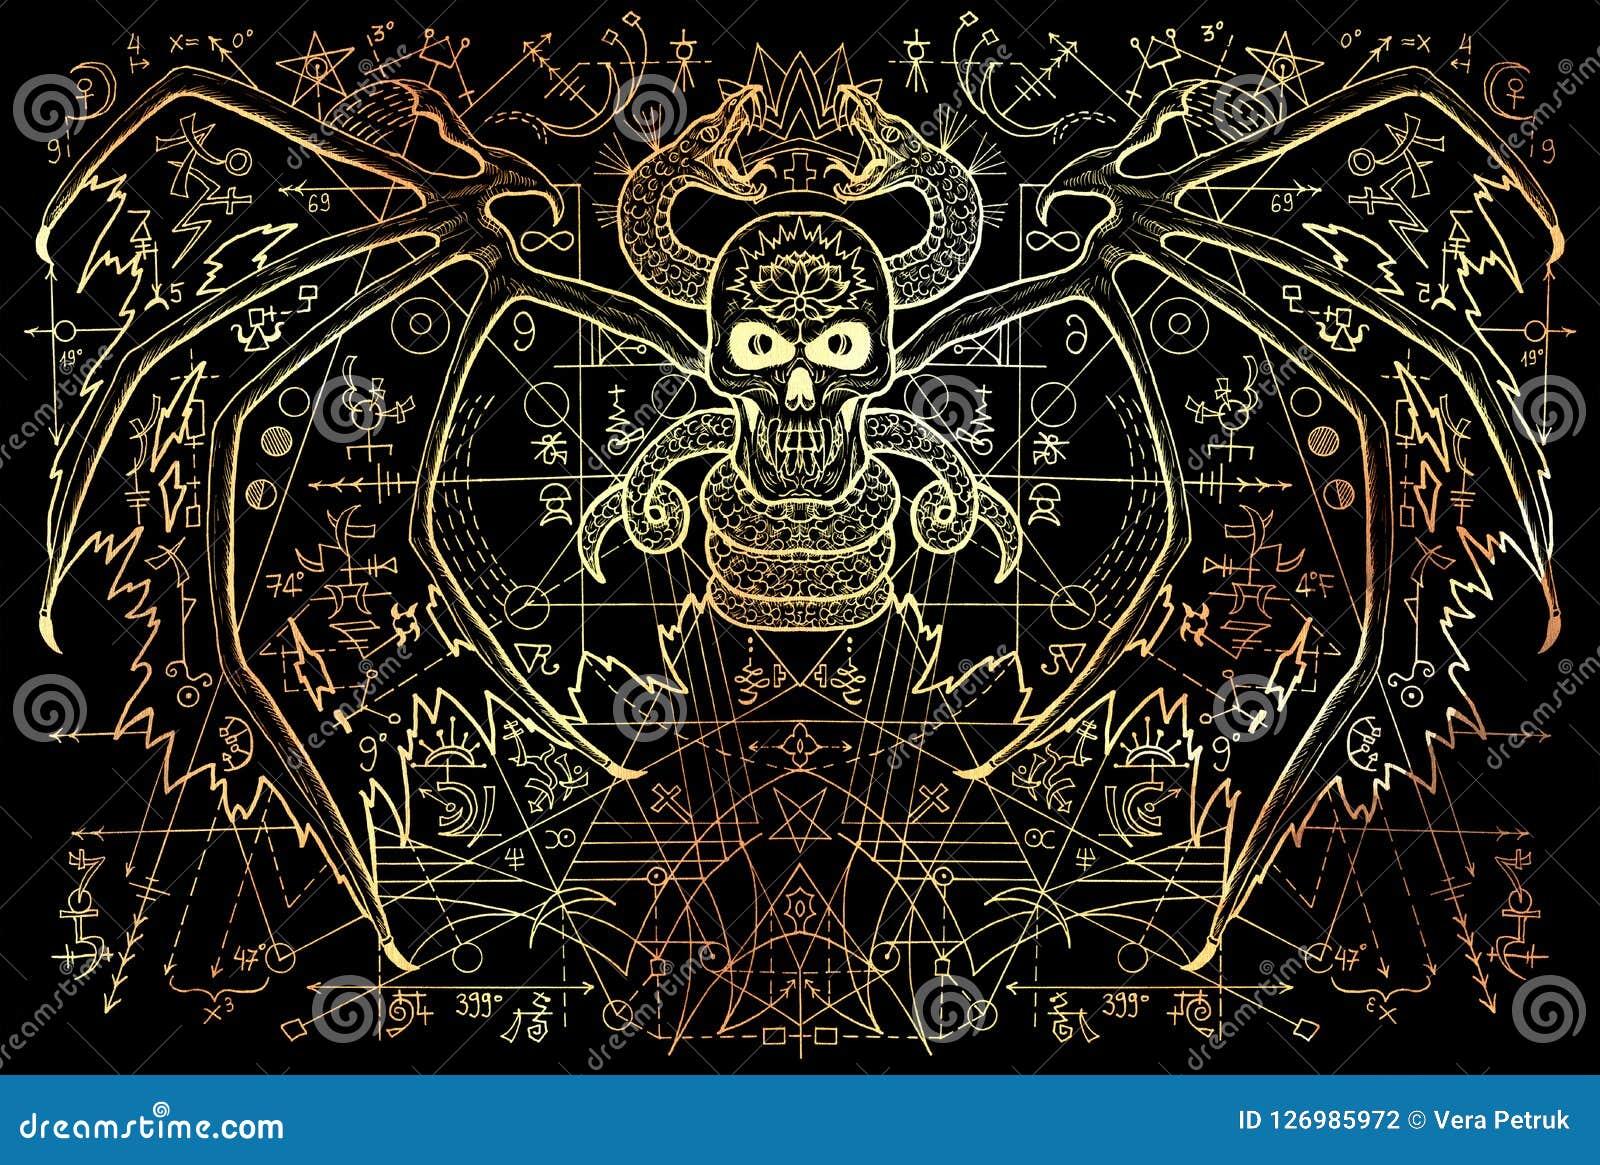 Подогнали демон и змейка с загадочными символами и геометрическая линия на черноте